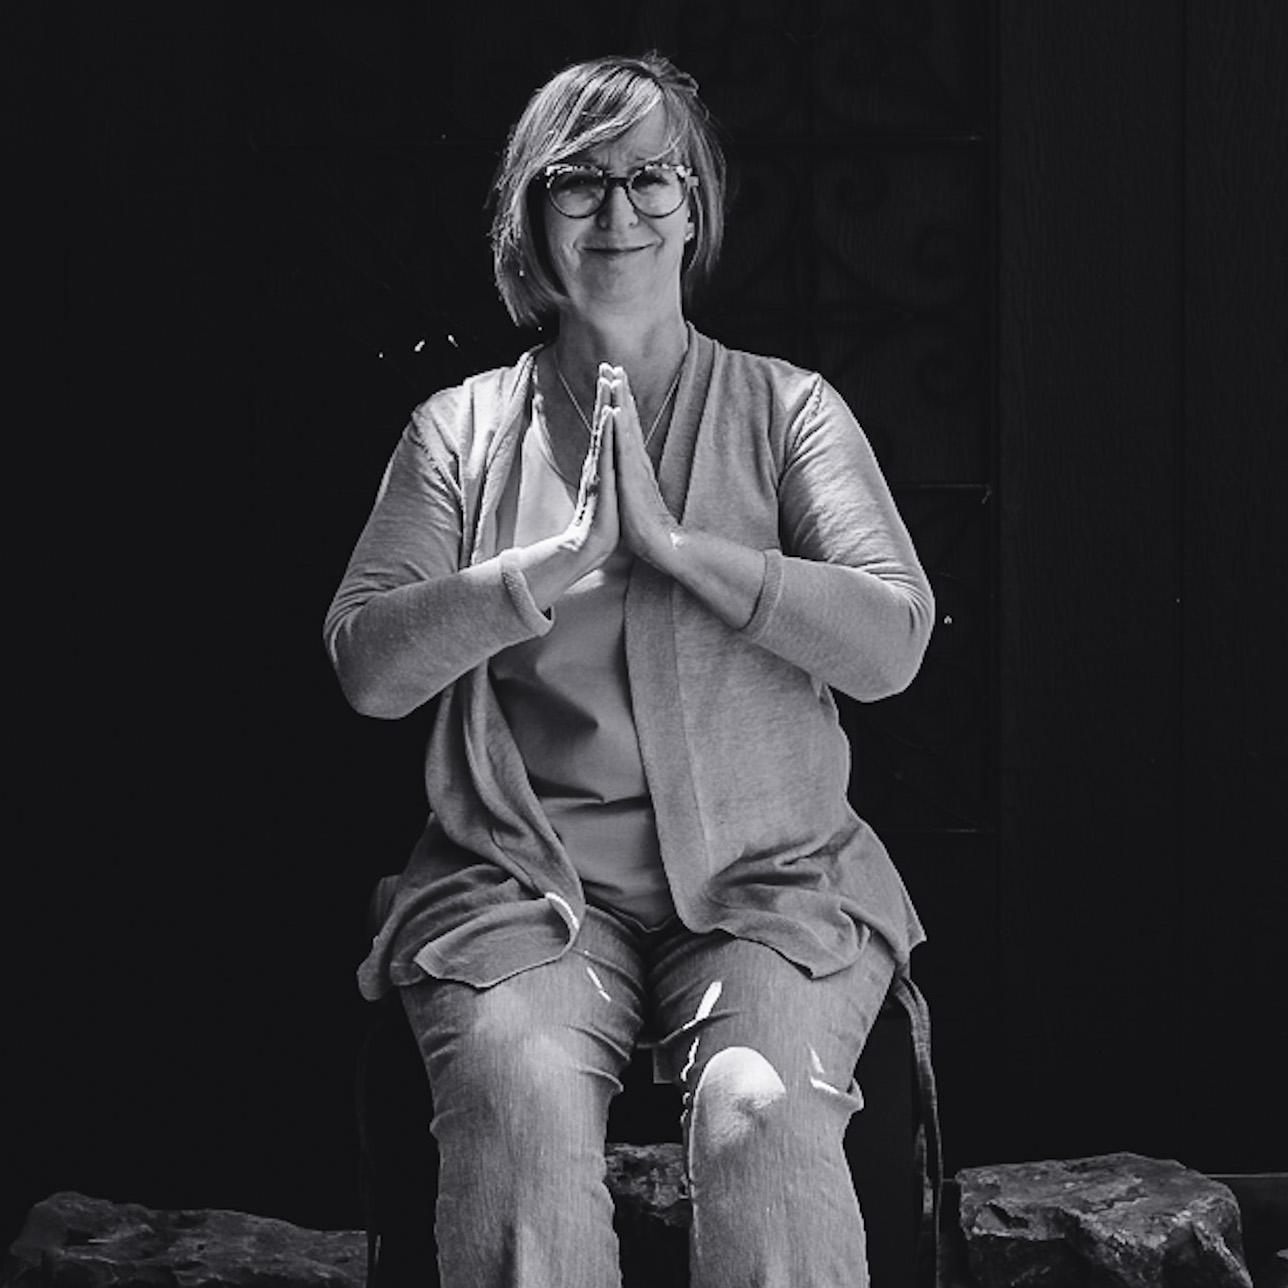 Heather Skoll, Founder of LifeNotes Wisdom Inc